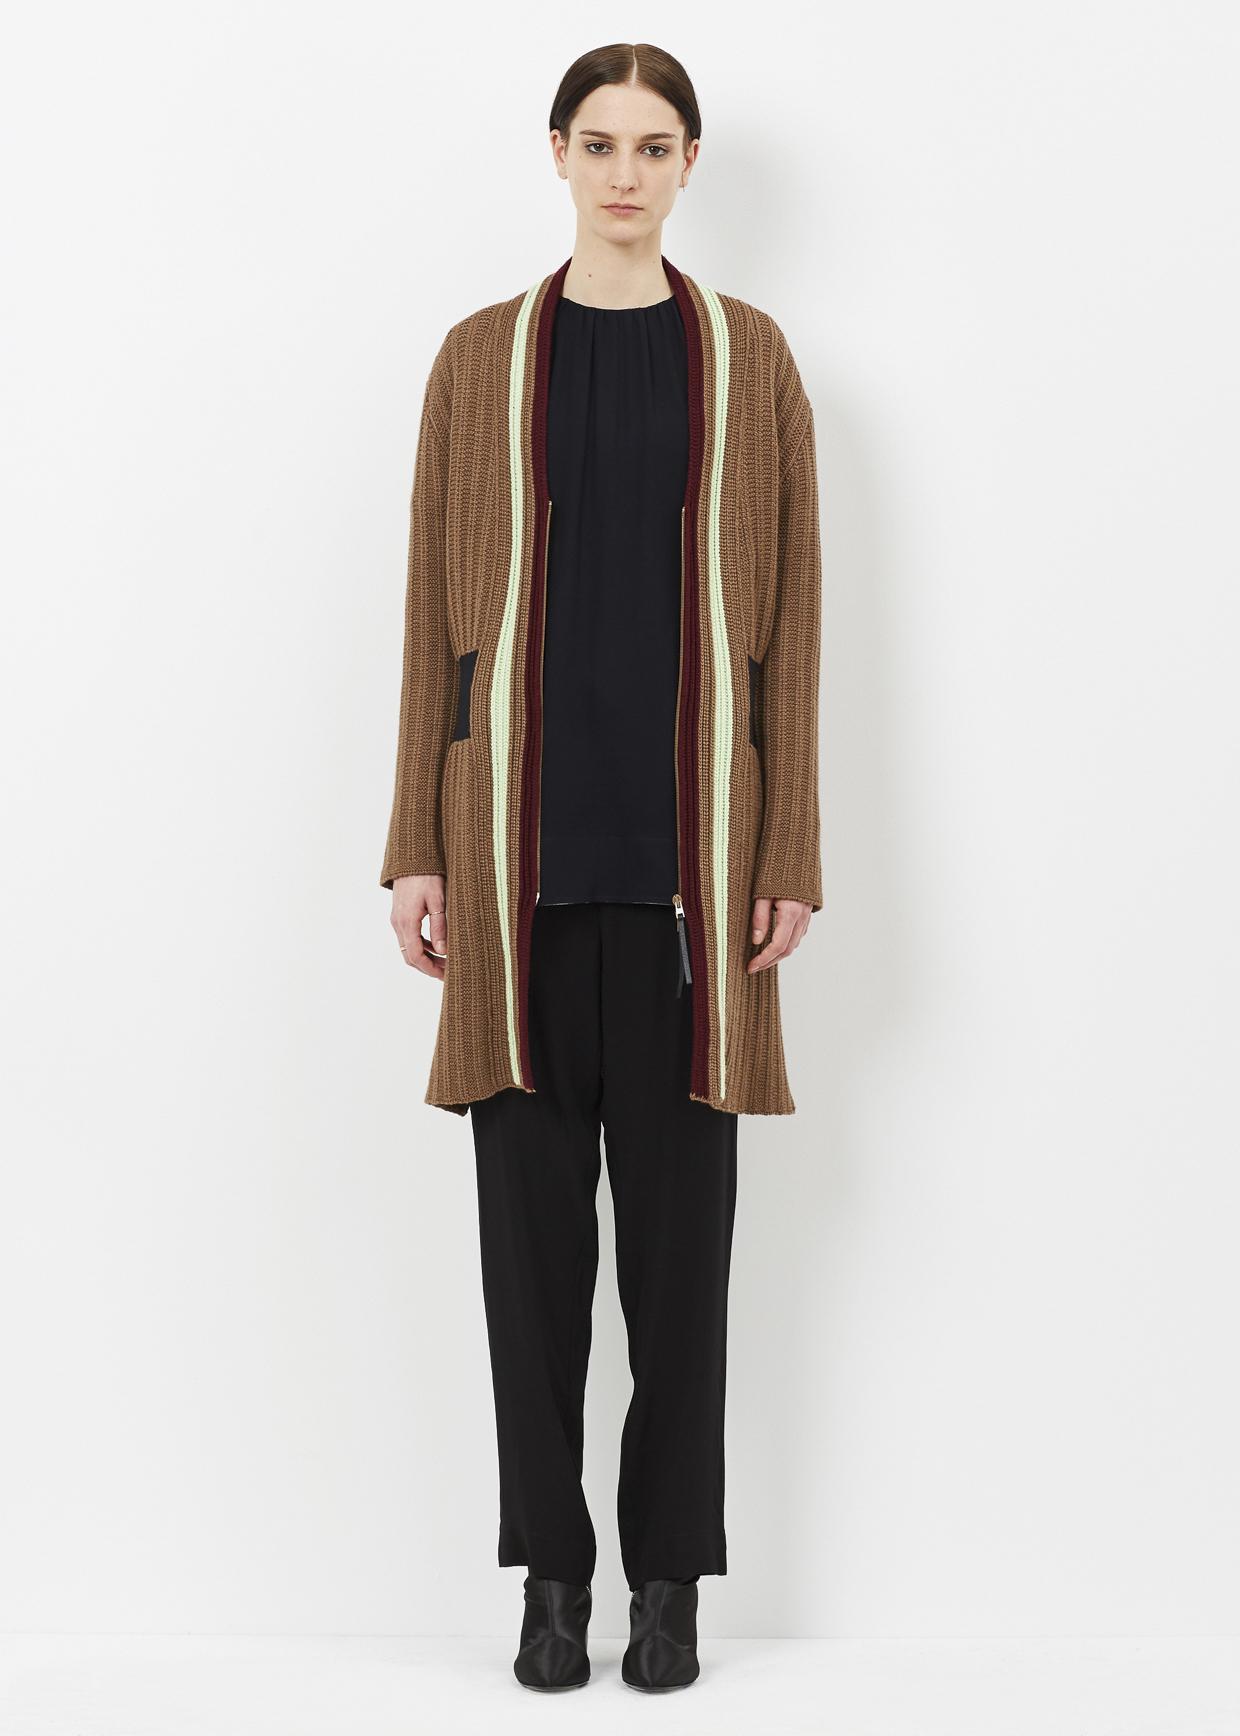 Duster Jacket Knitting Pattern : Marni Raw Sienna Knit Duster Coat Lyst